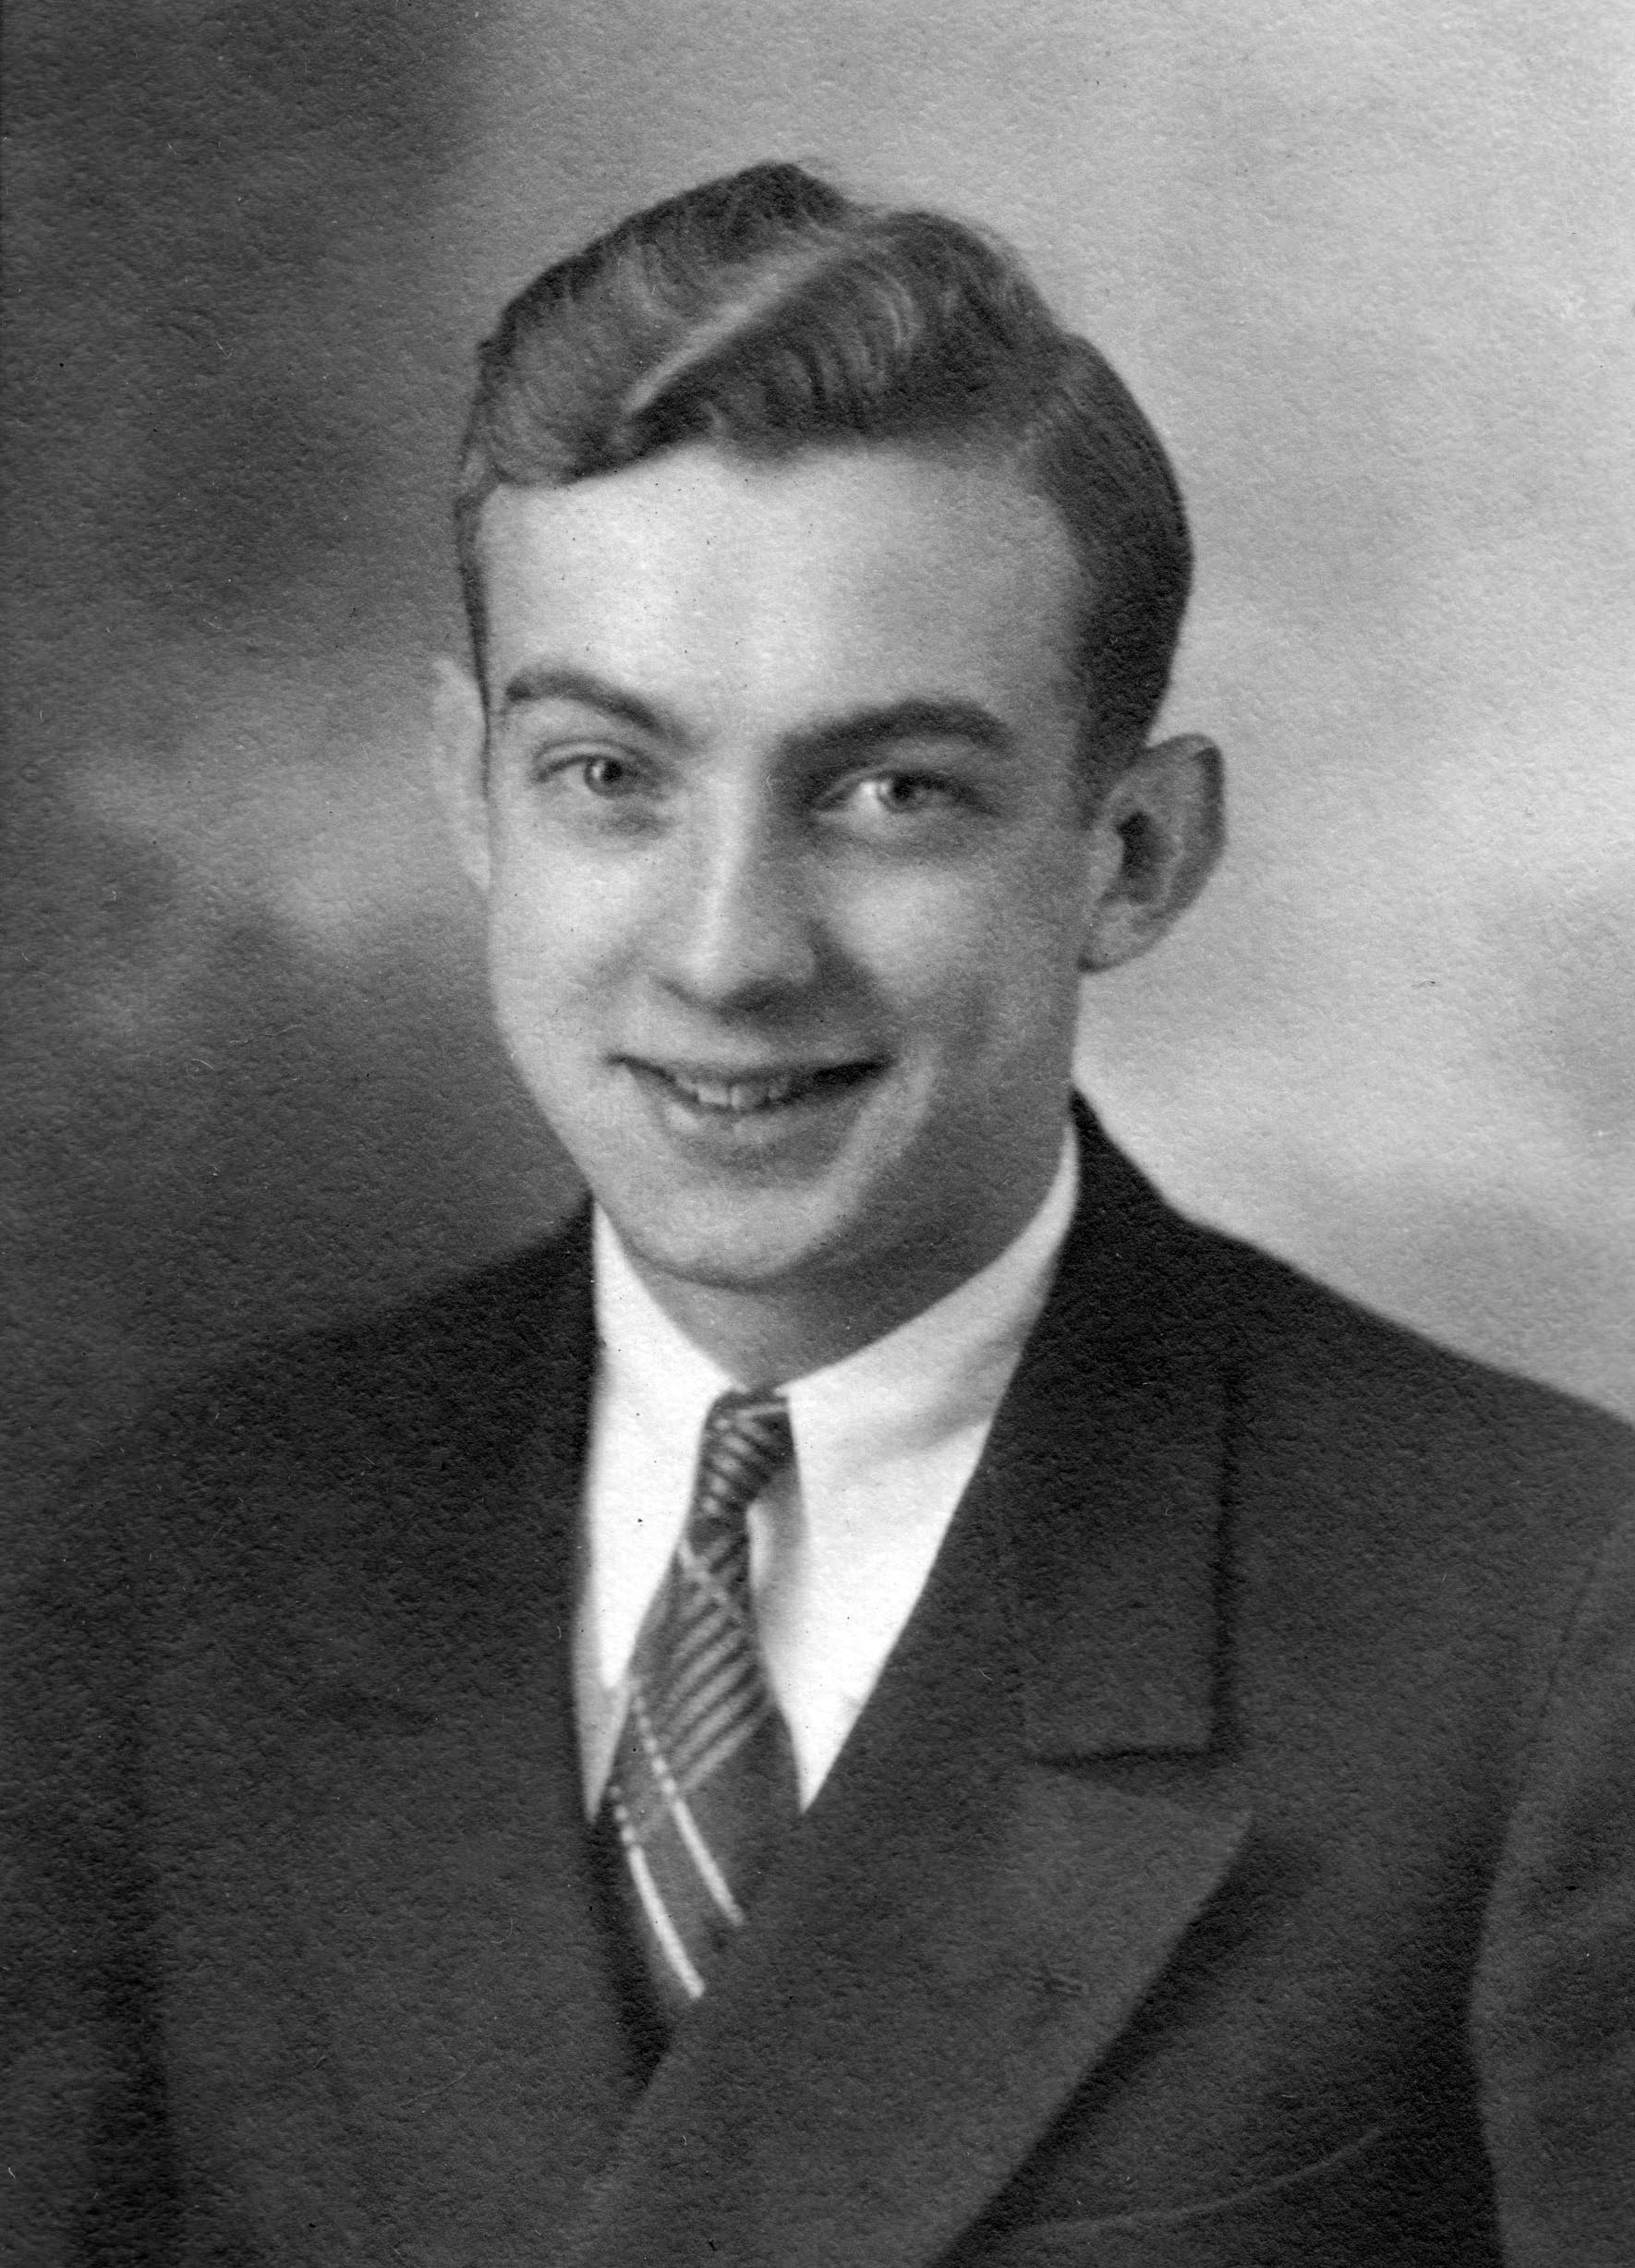 Gilbert S. Gruber 1929